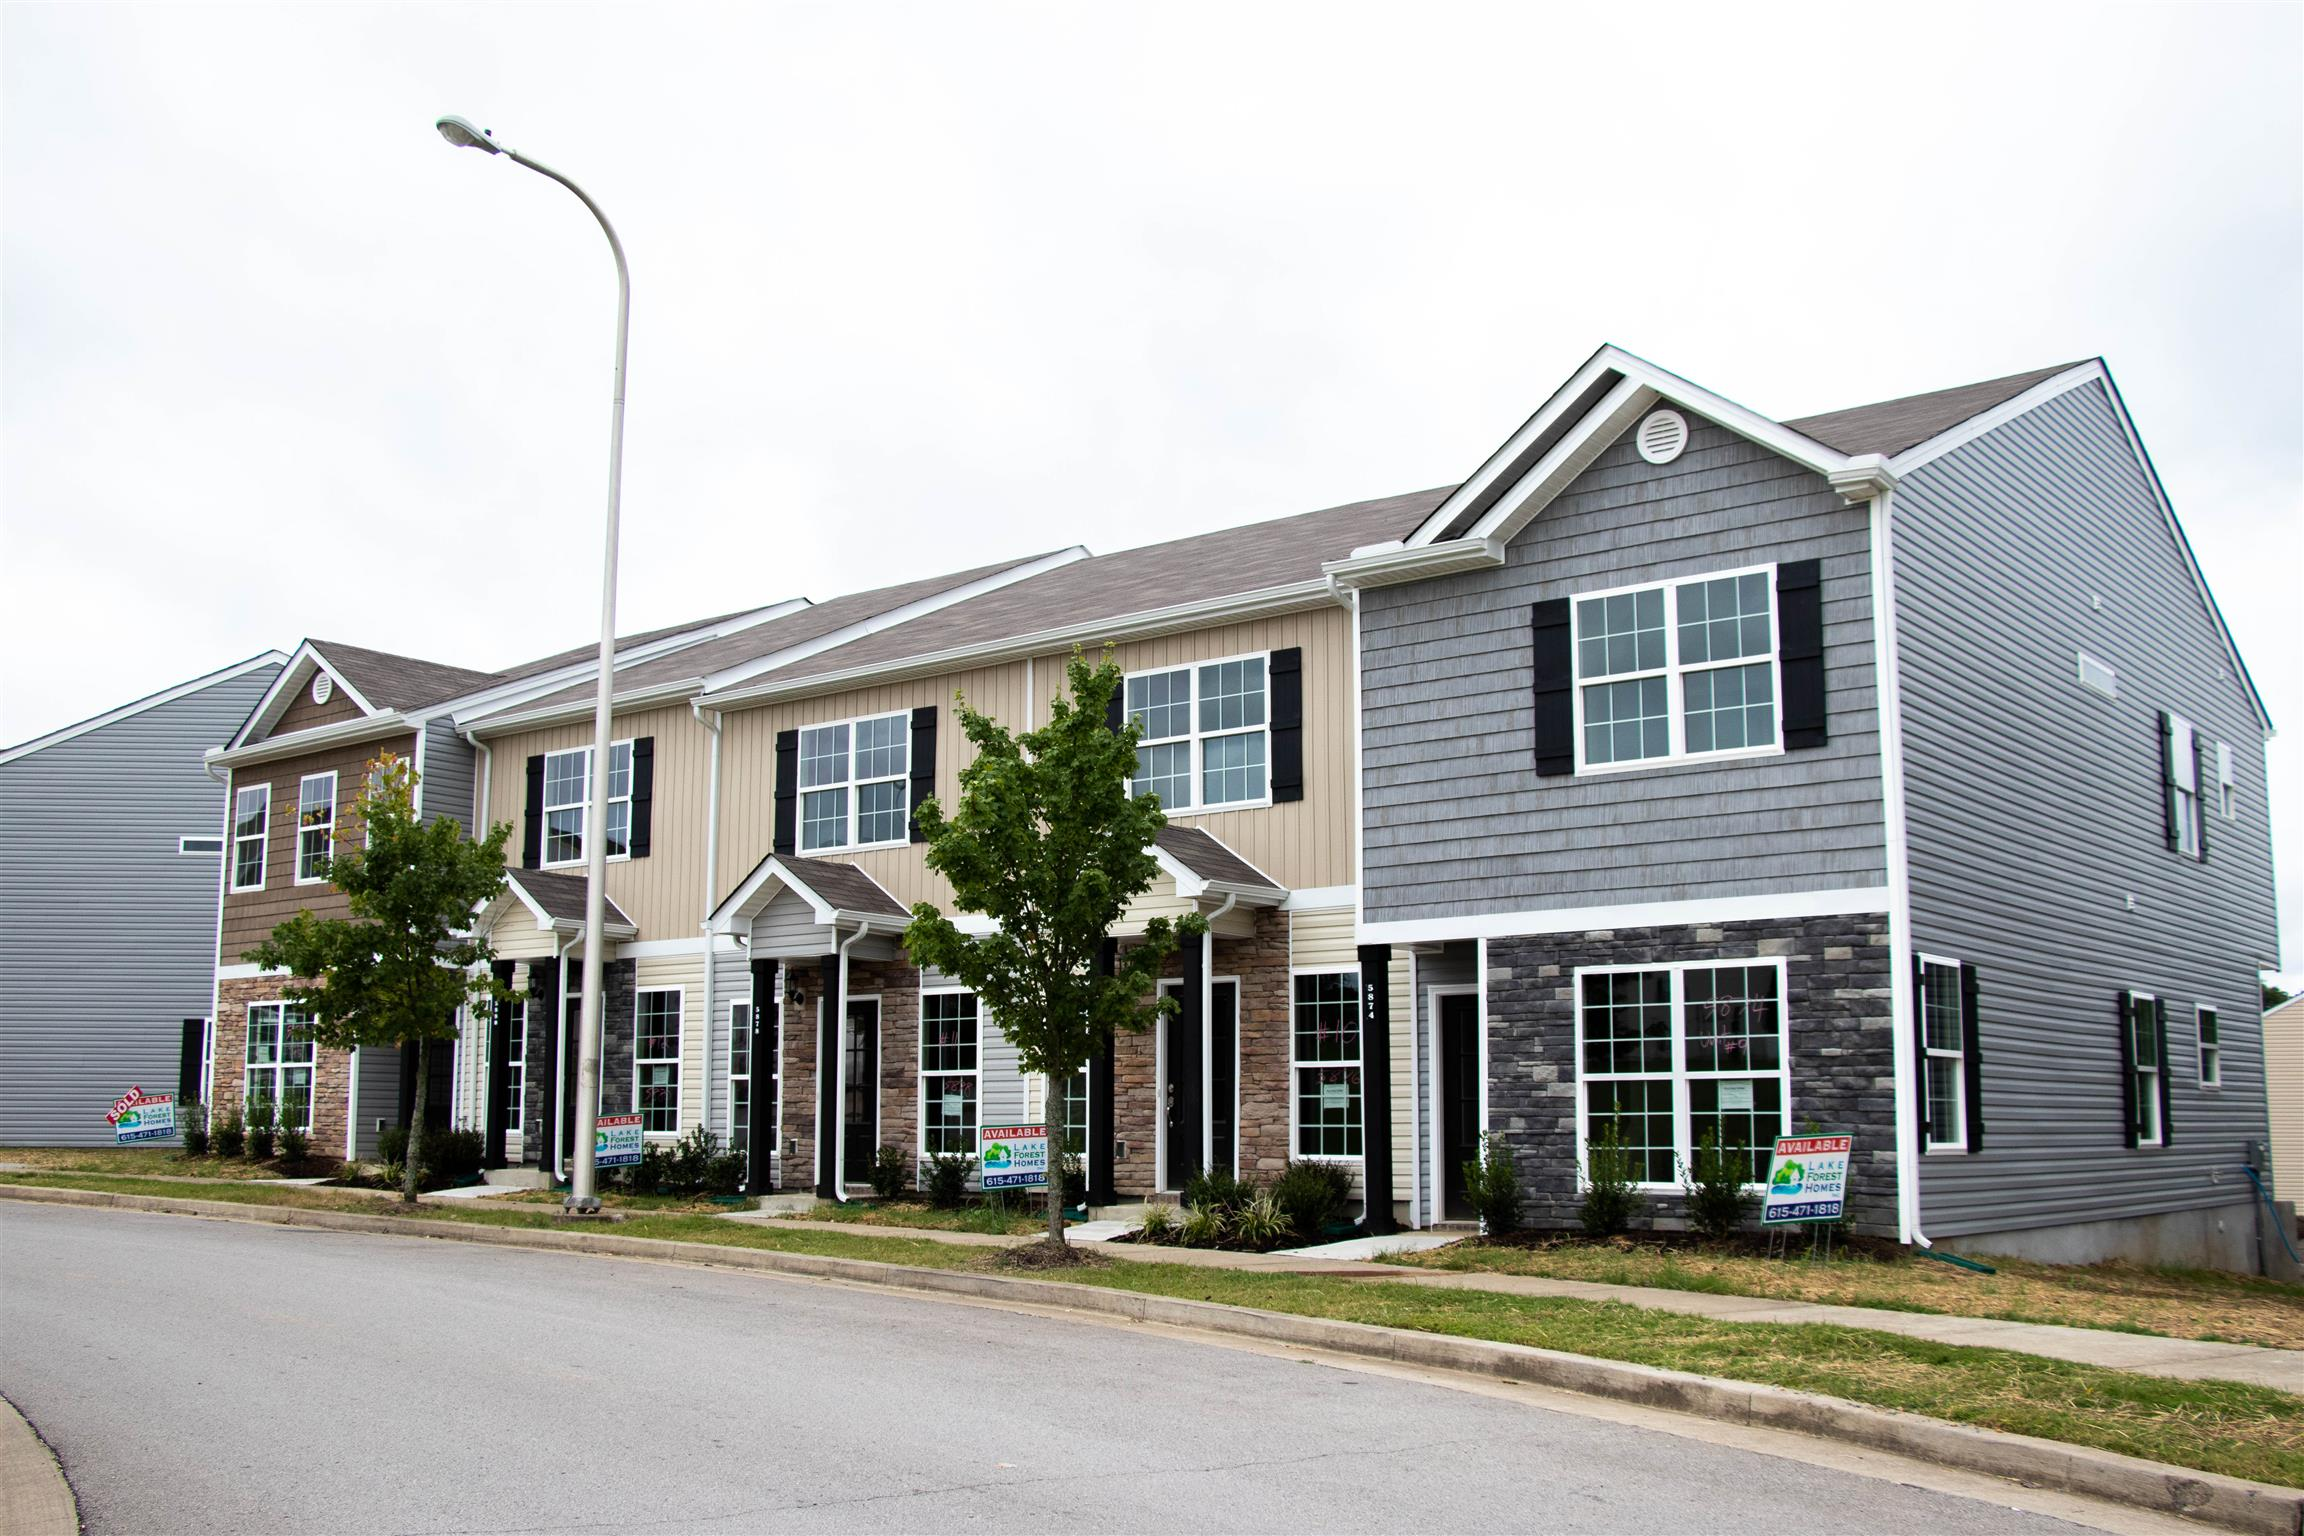 5874 Monroe Xing, Antioch, TN 37013 - Antioch, TN real estate listing